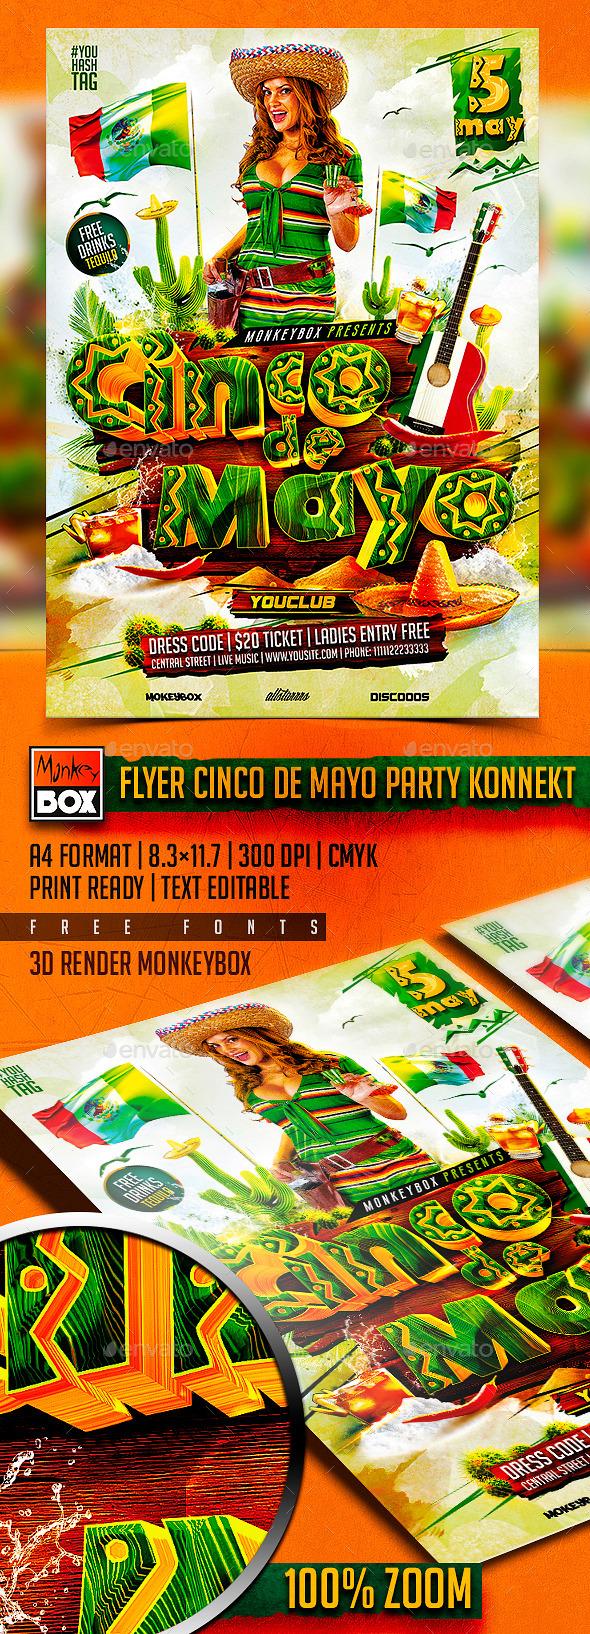 GraphicRiver Flyer Cinco de Mayo Party Konnekt 11072333